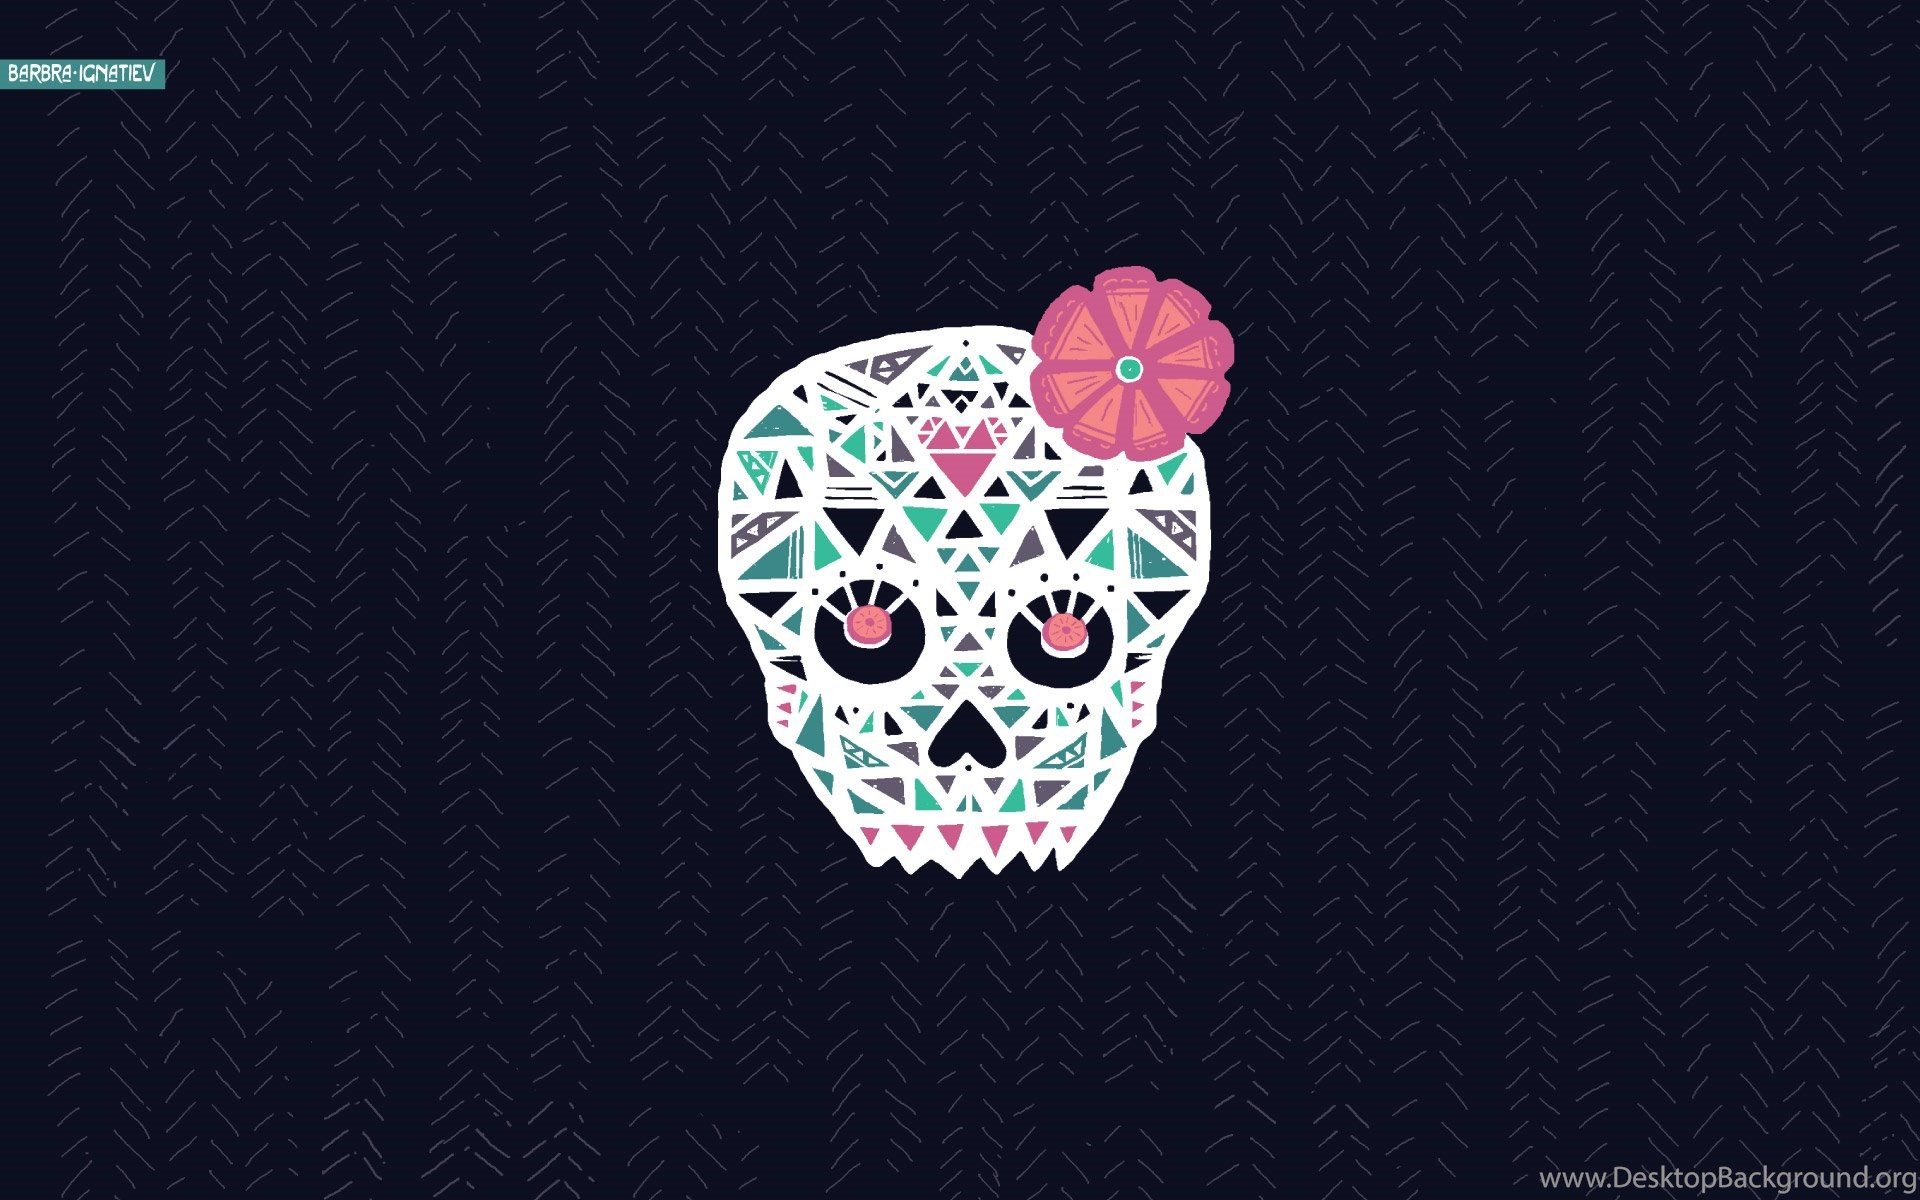 Sugar Skull Wallpapers Photo Desktop Background